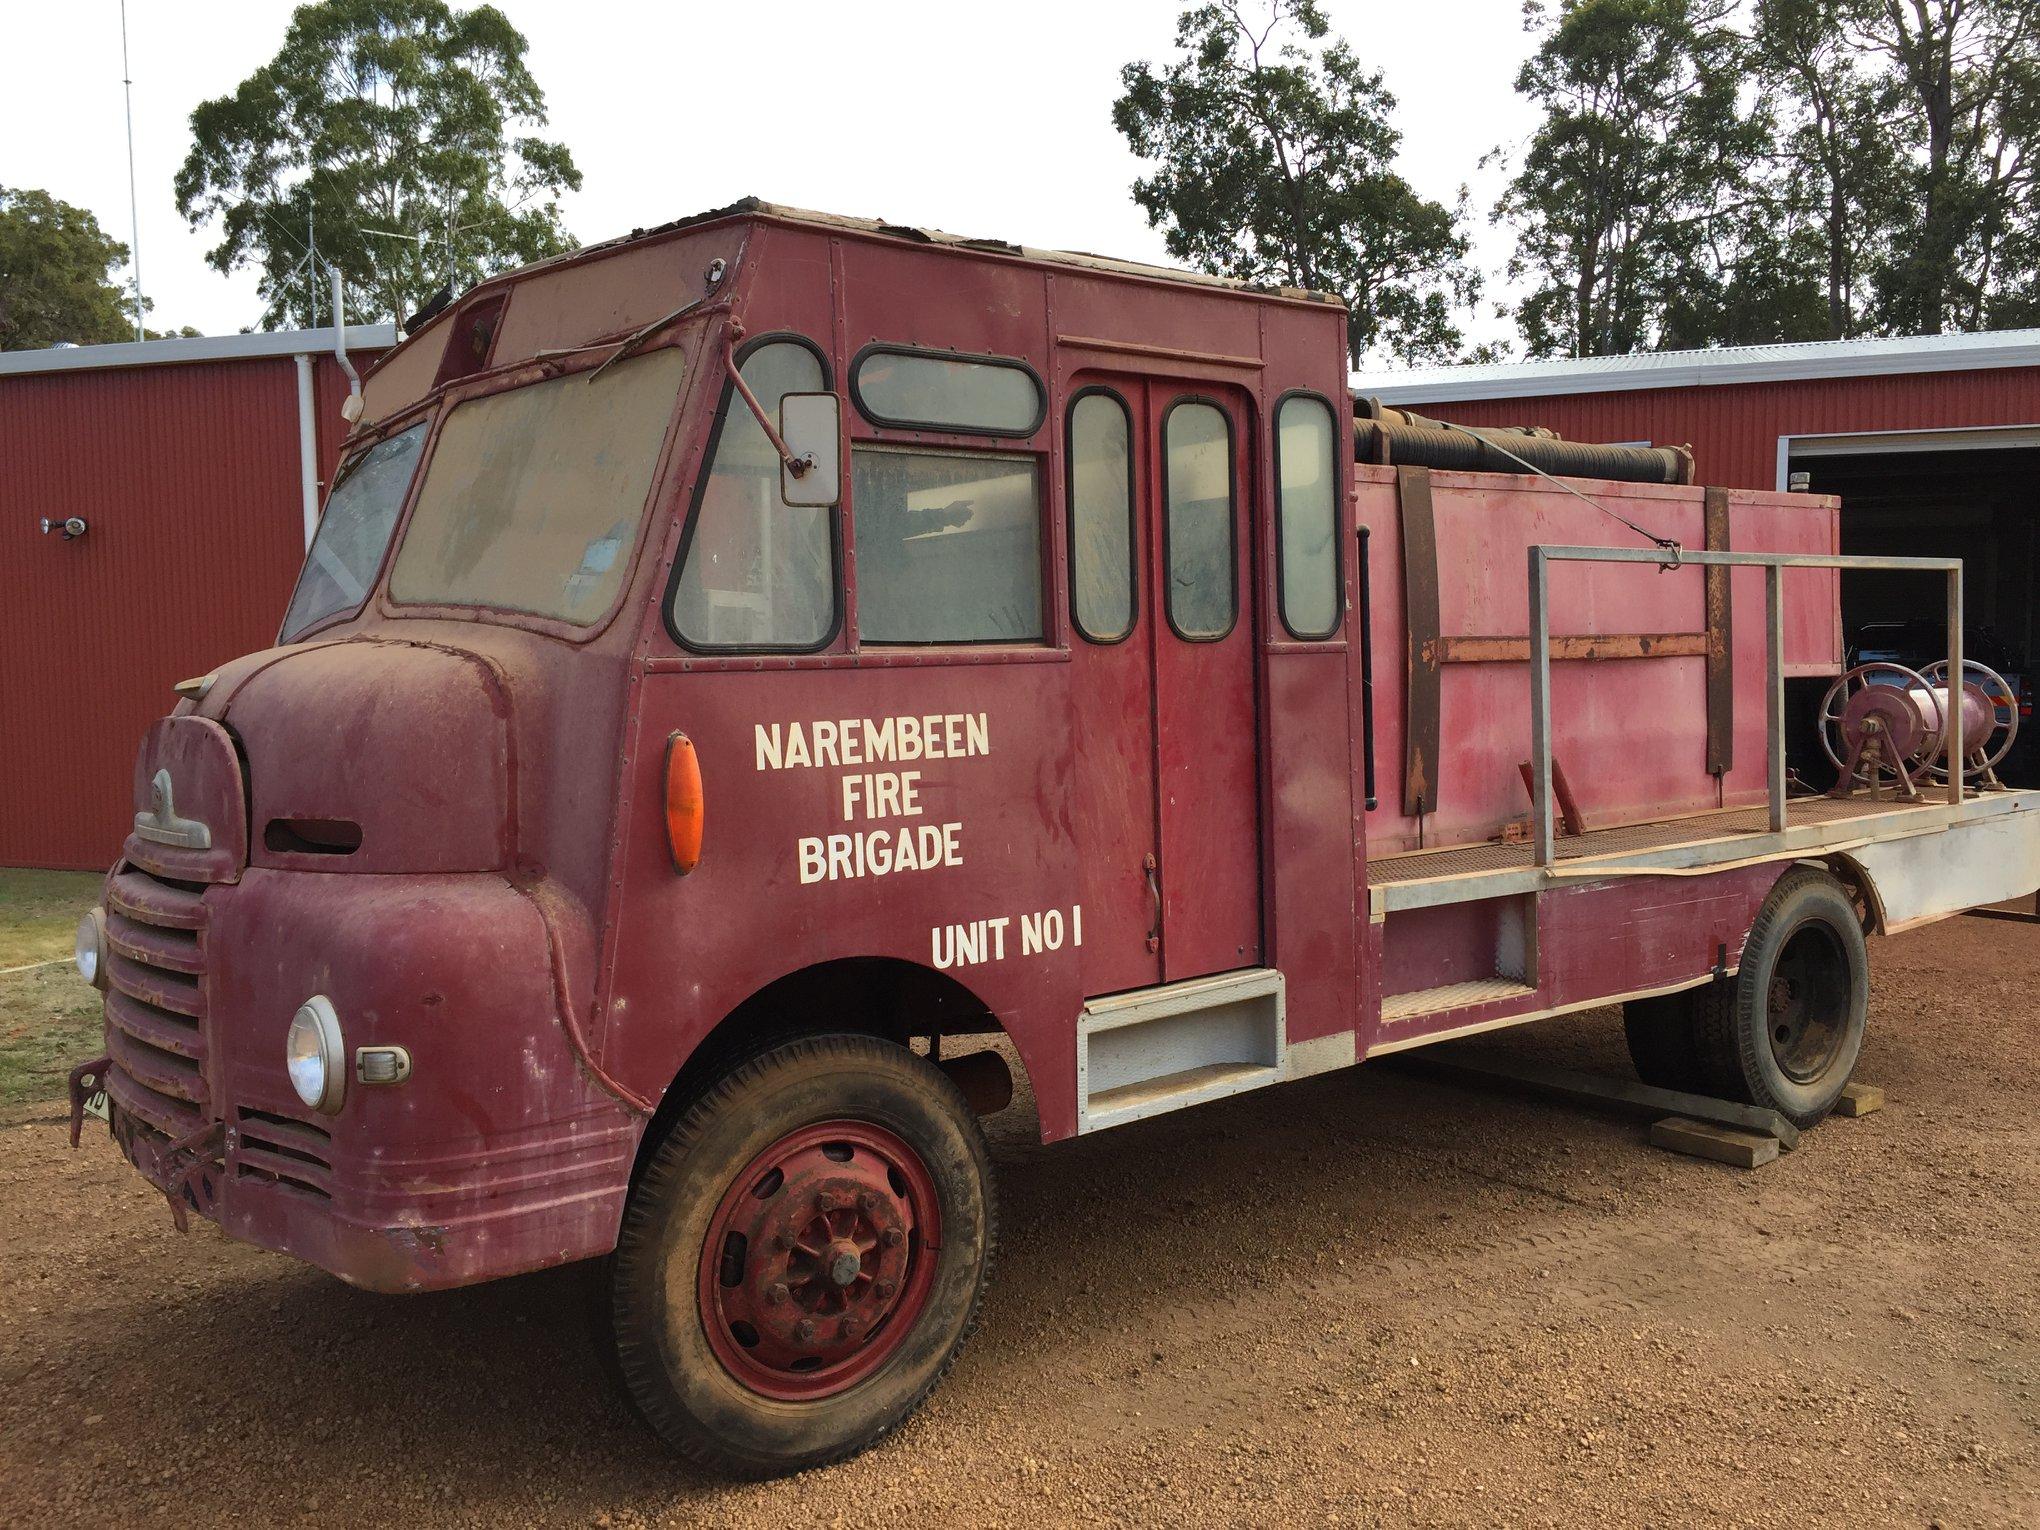 1953 Bedford Tanker from Narembeen Bush Fire Brigade 1 - Pre restoration